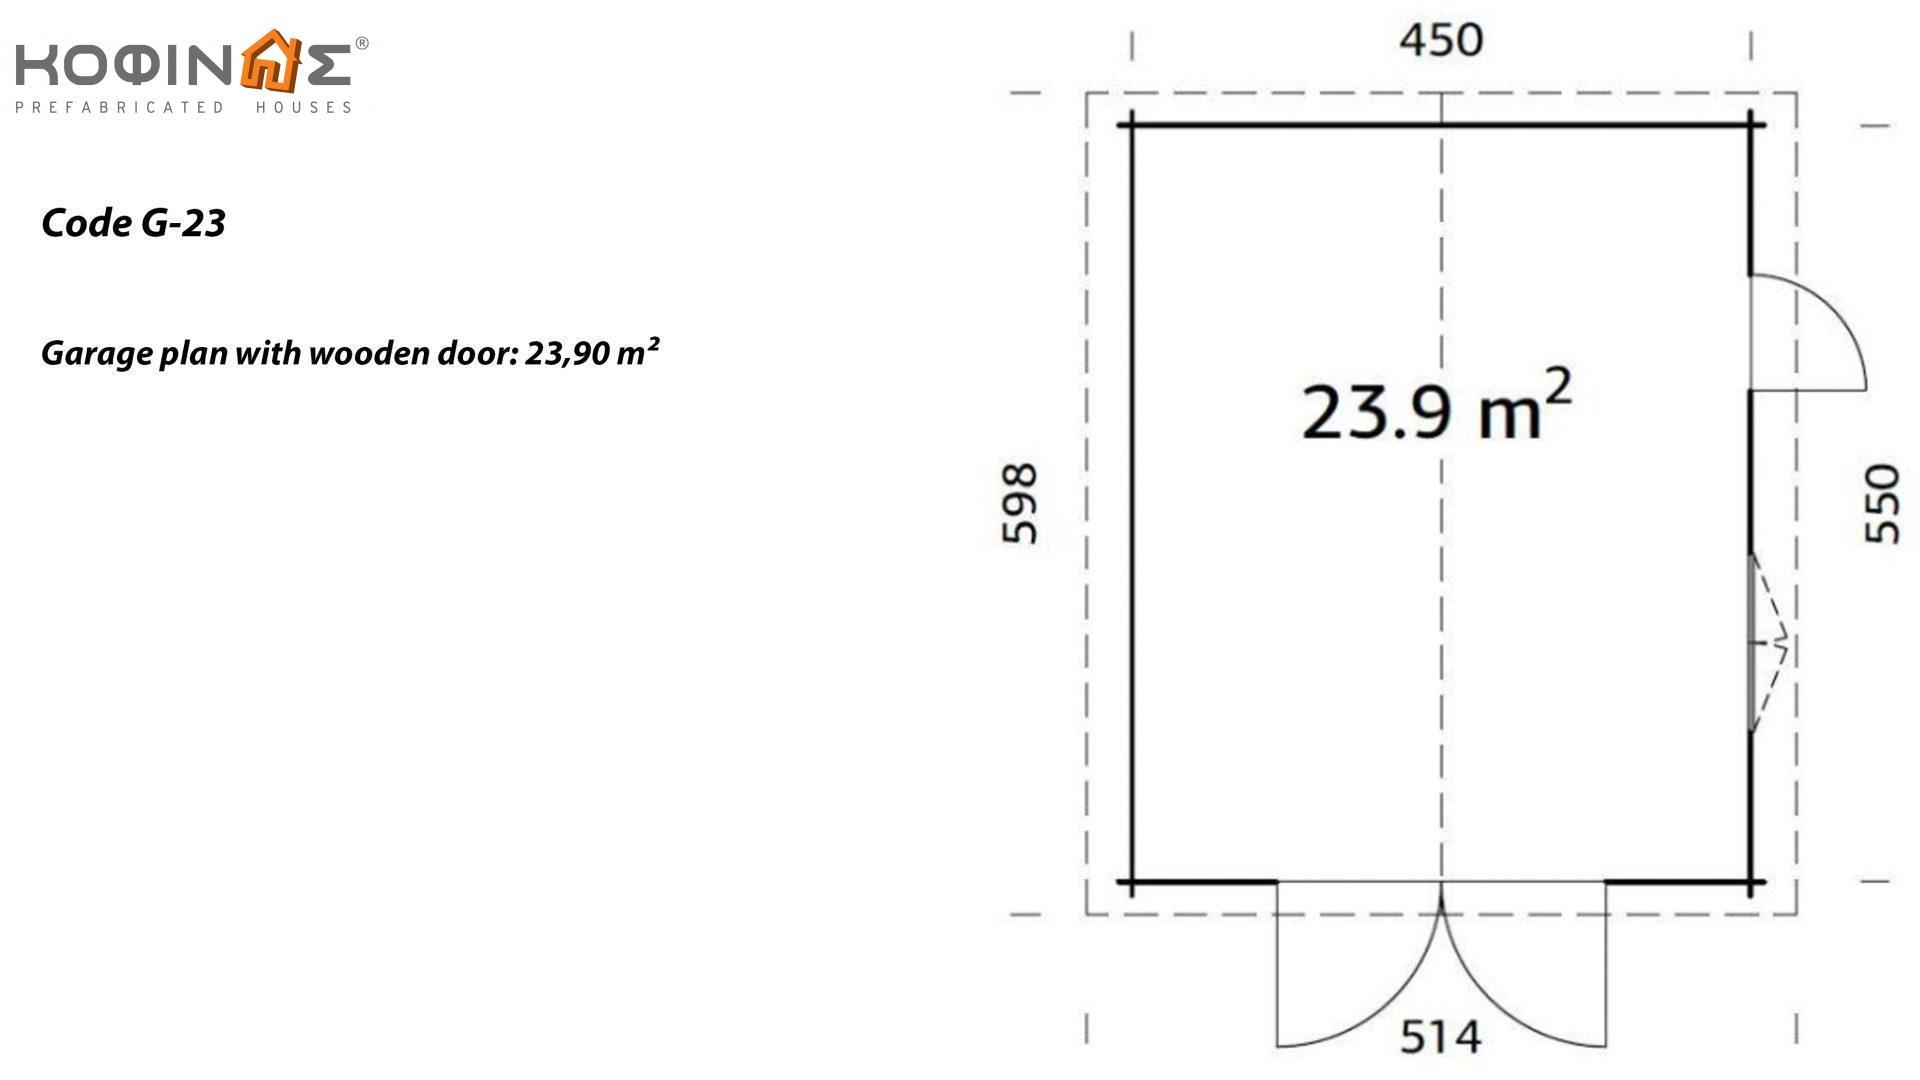 Garage G-23, total area 23.90 m²